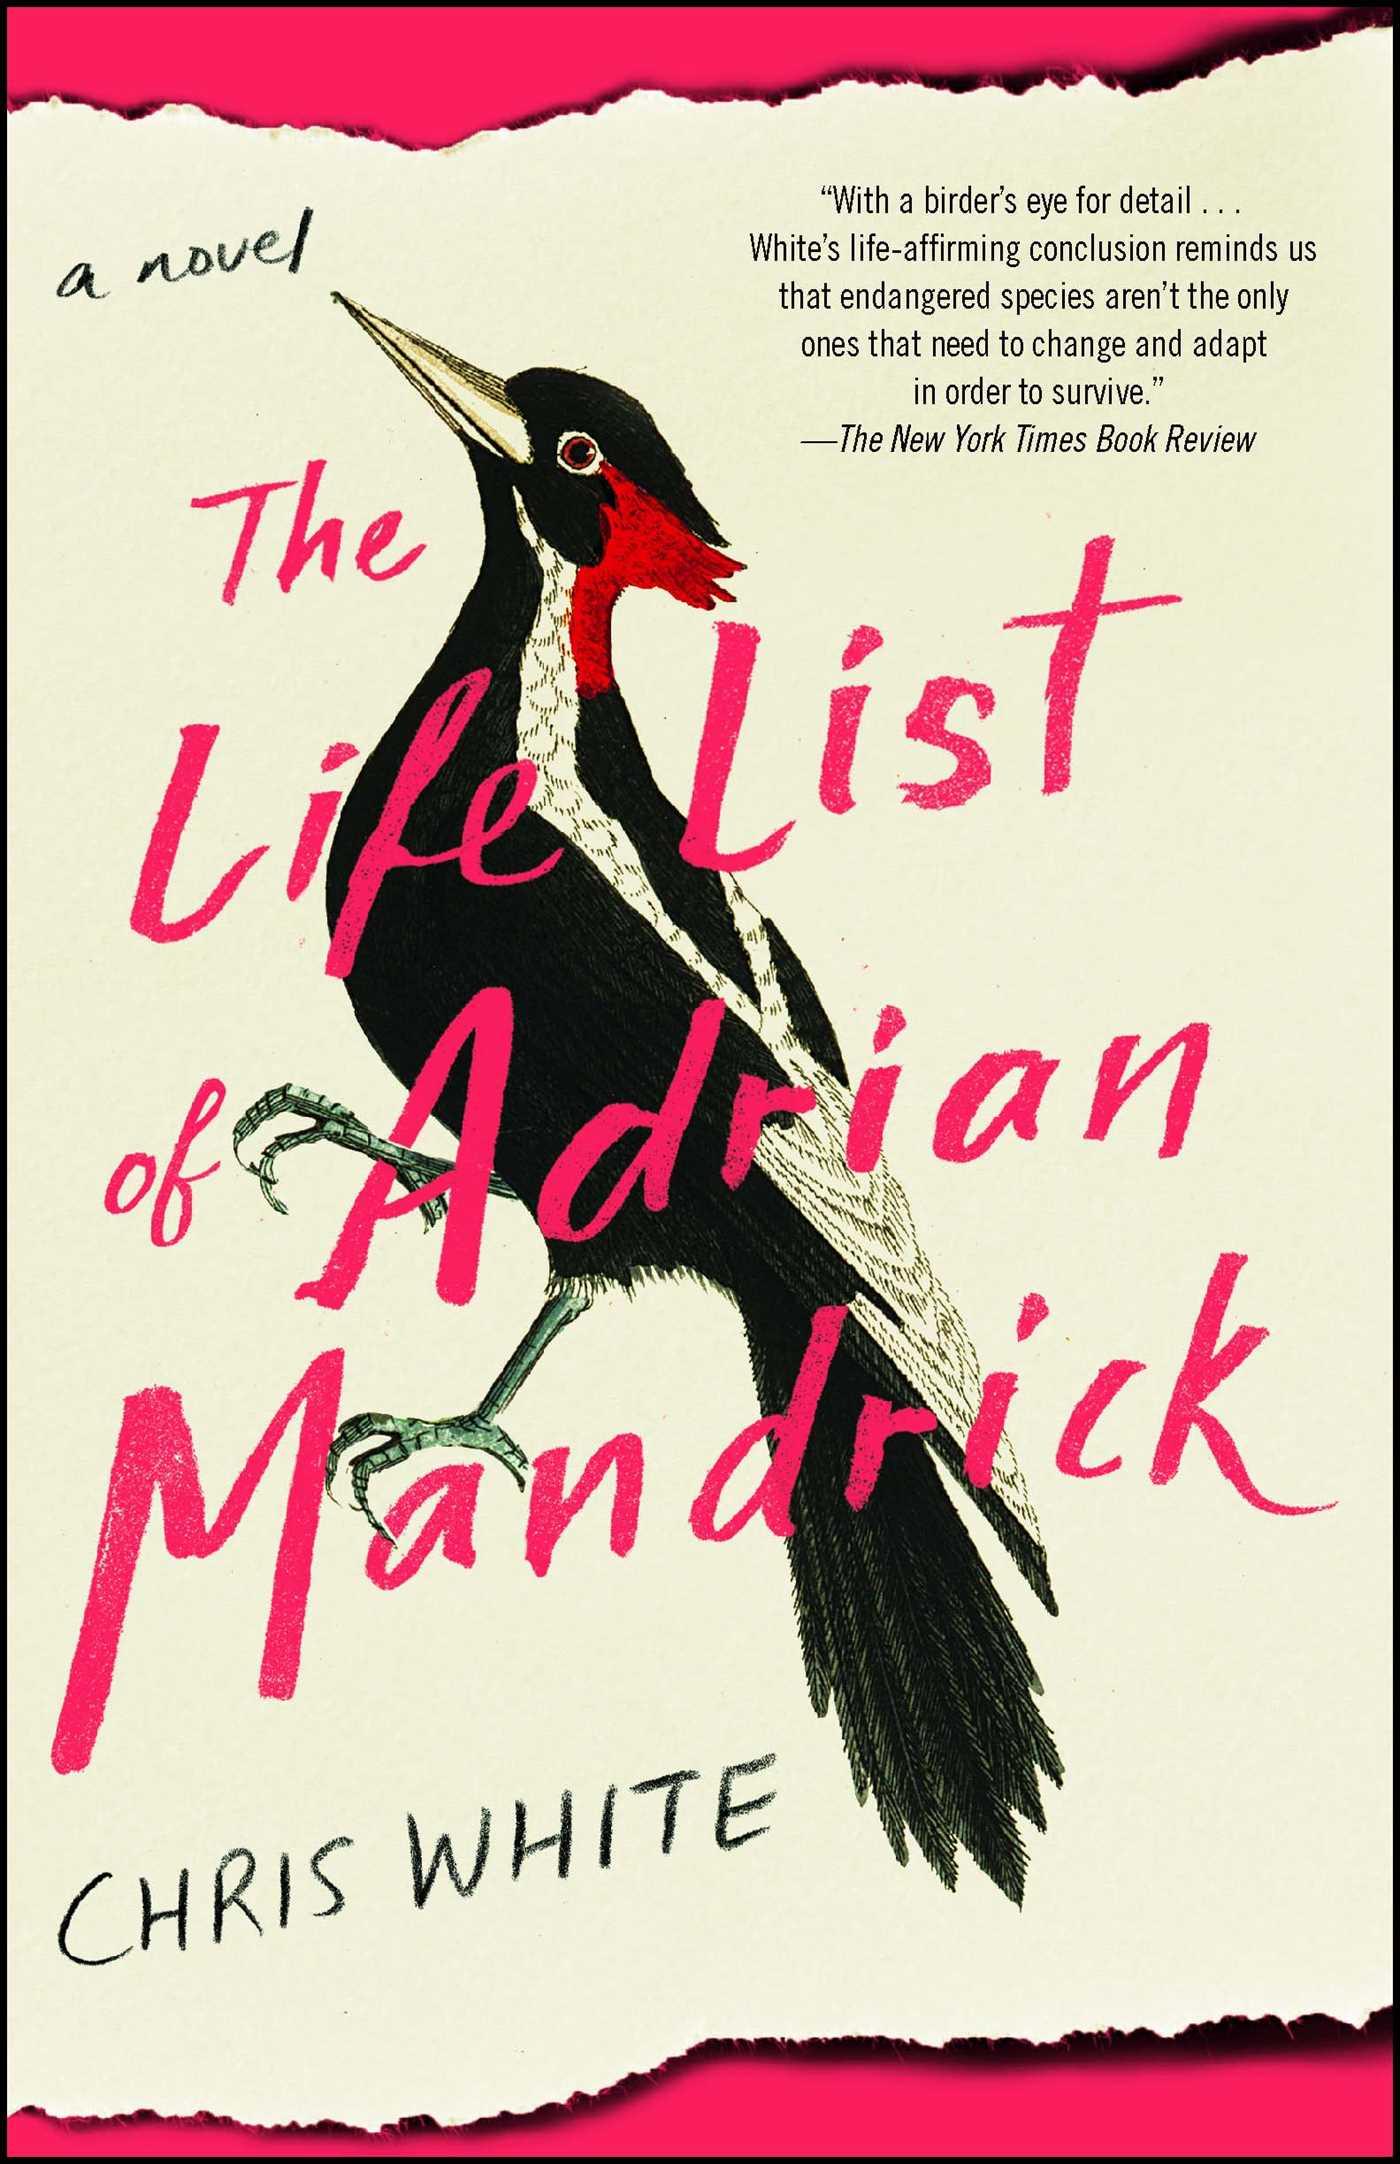 The life list of adrian mandrick 9781501174322 hr